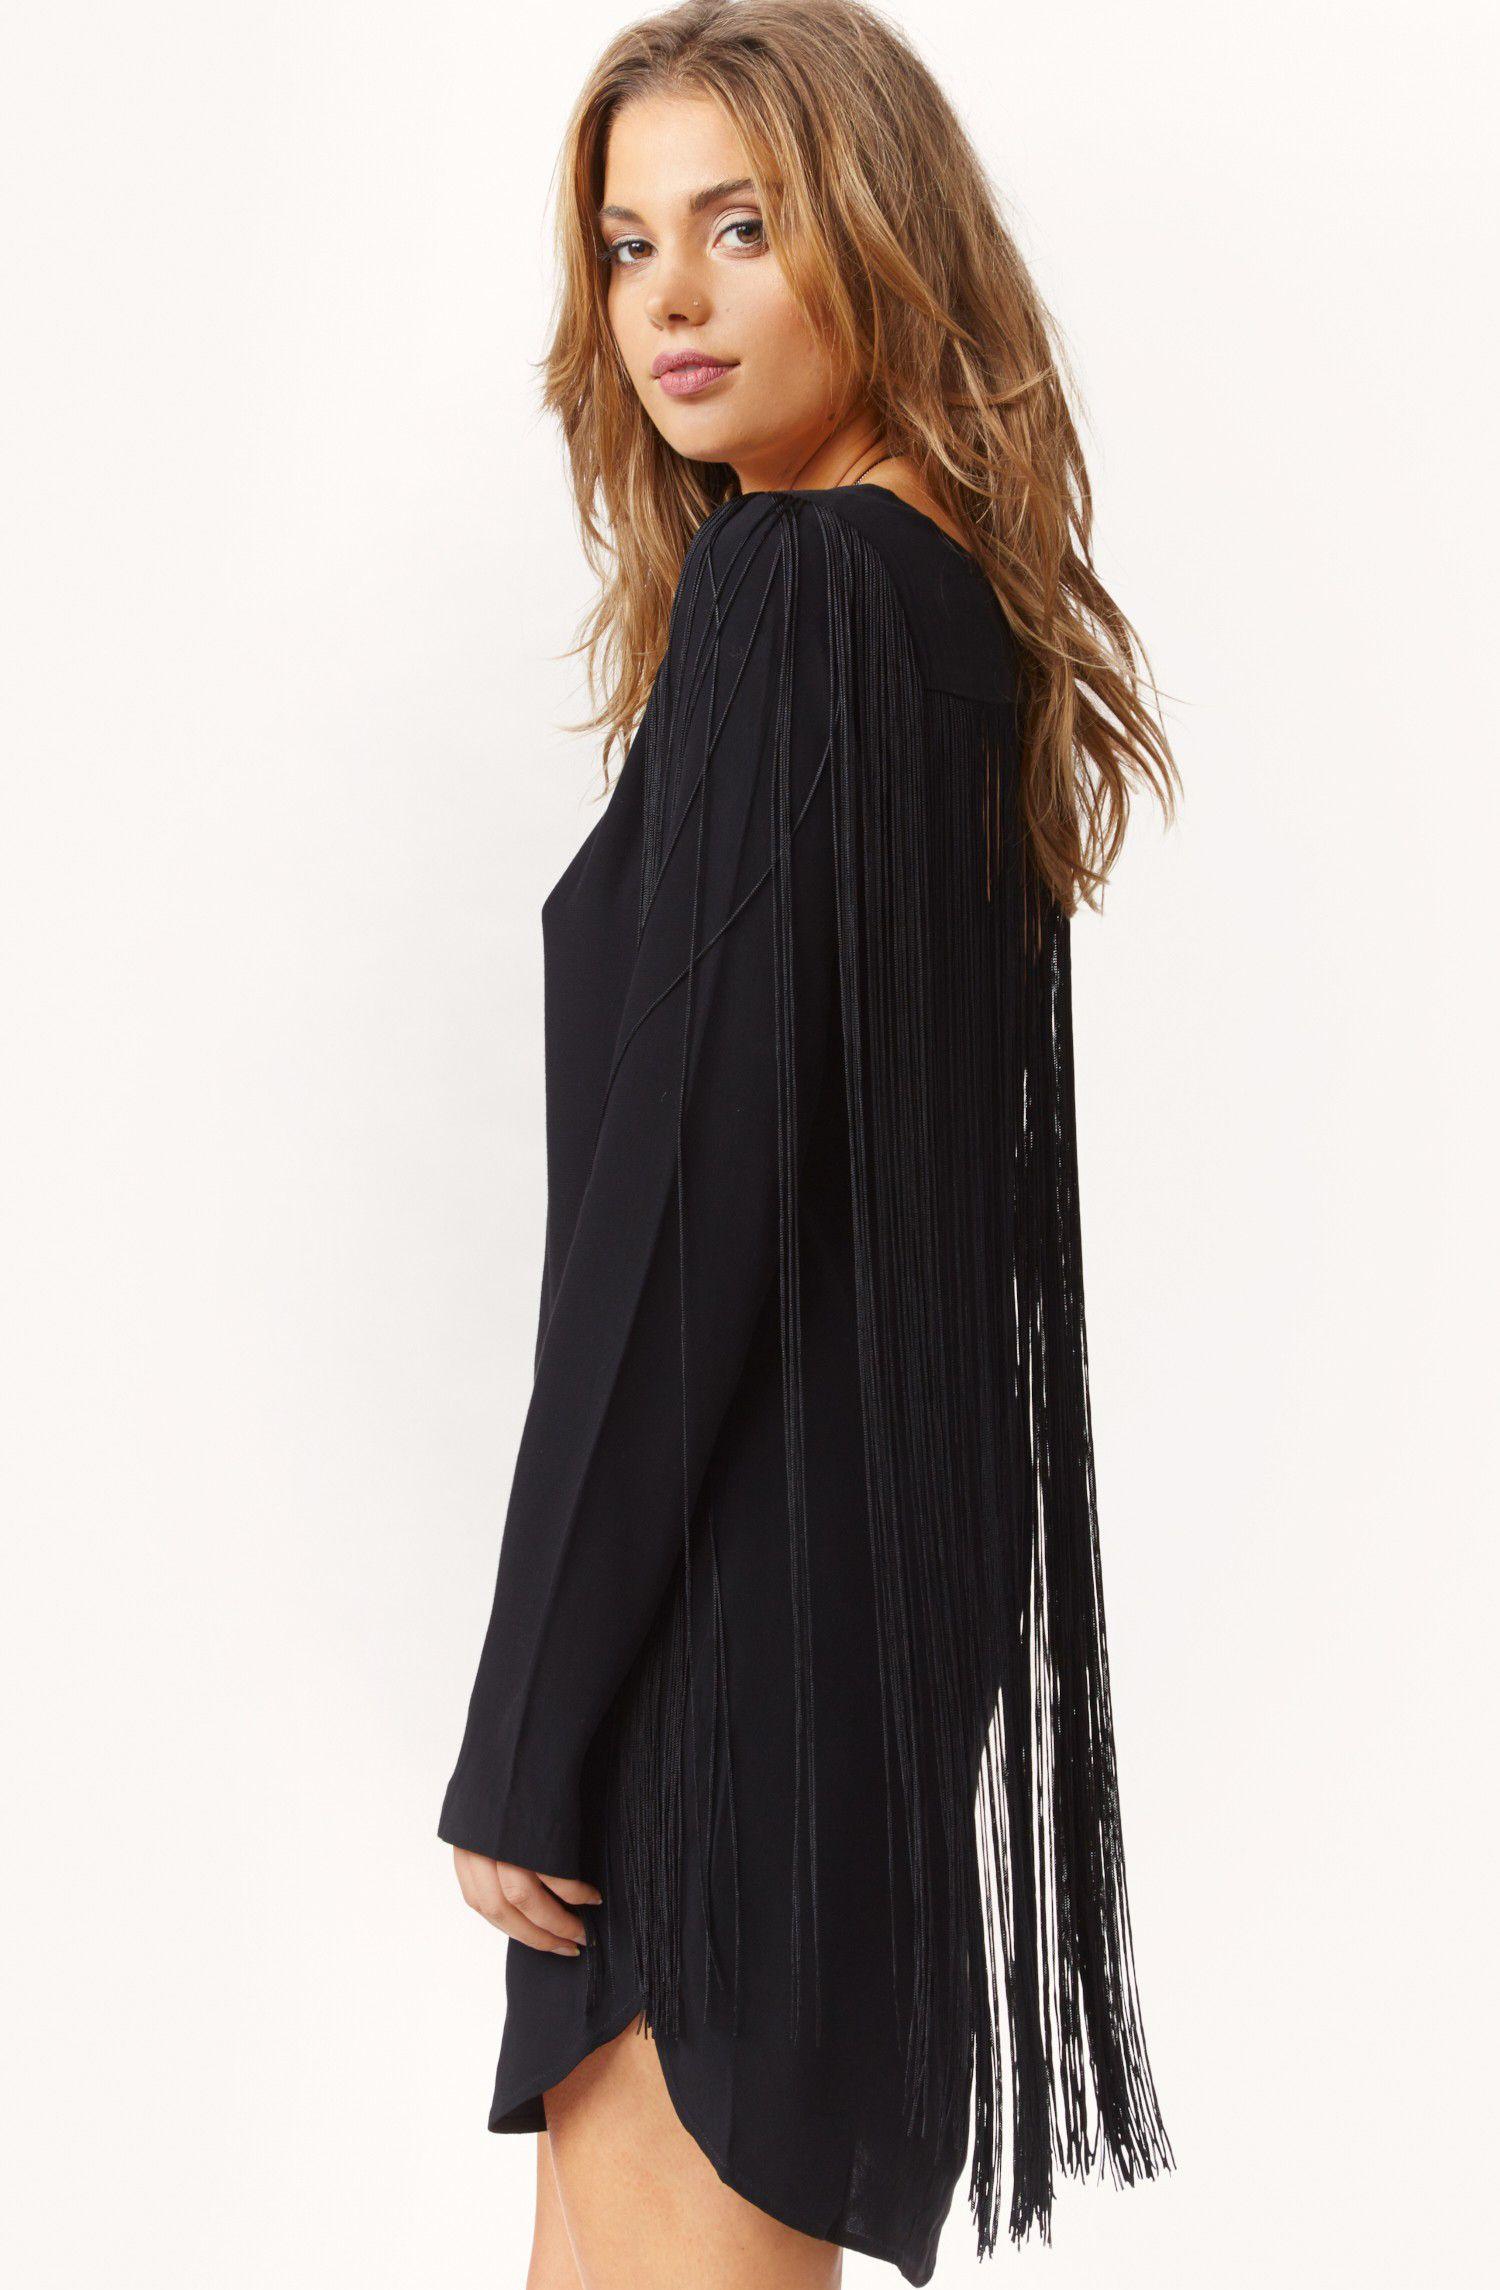 Black Long Sleeve Tassel Dress Sheinside Com Tassel Dress Fashion Boho Festival Fashion Fashion [ 2290 x 1500 Pixel ]